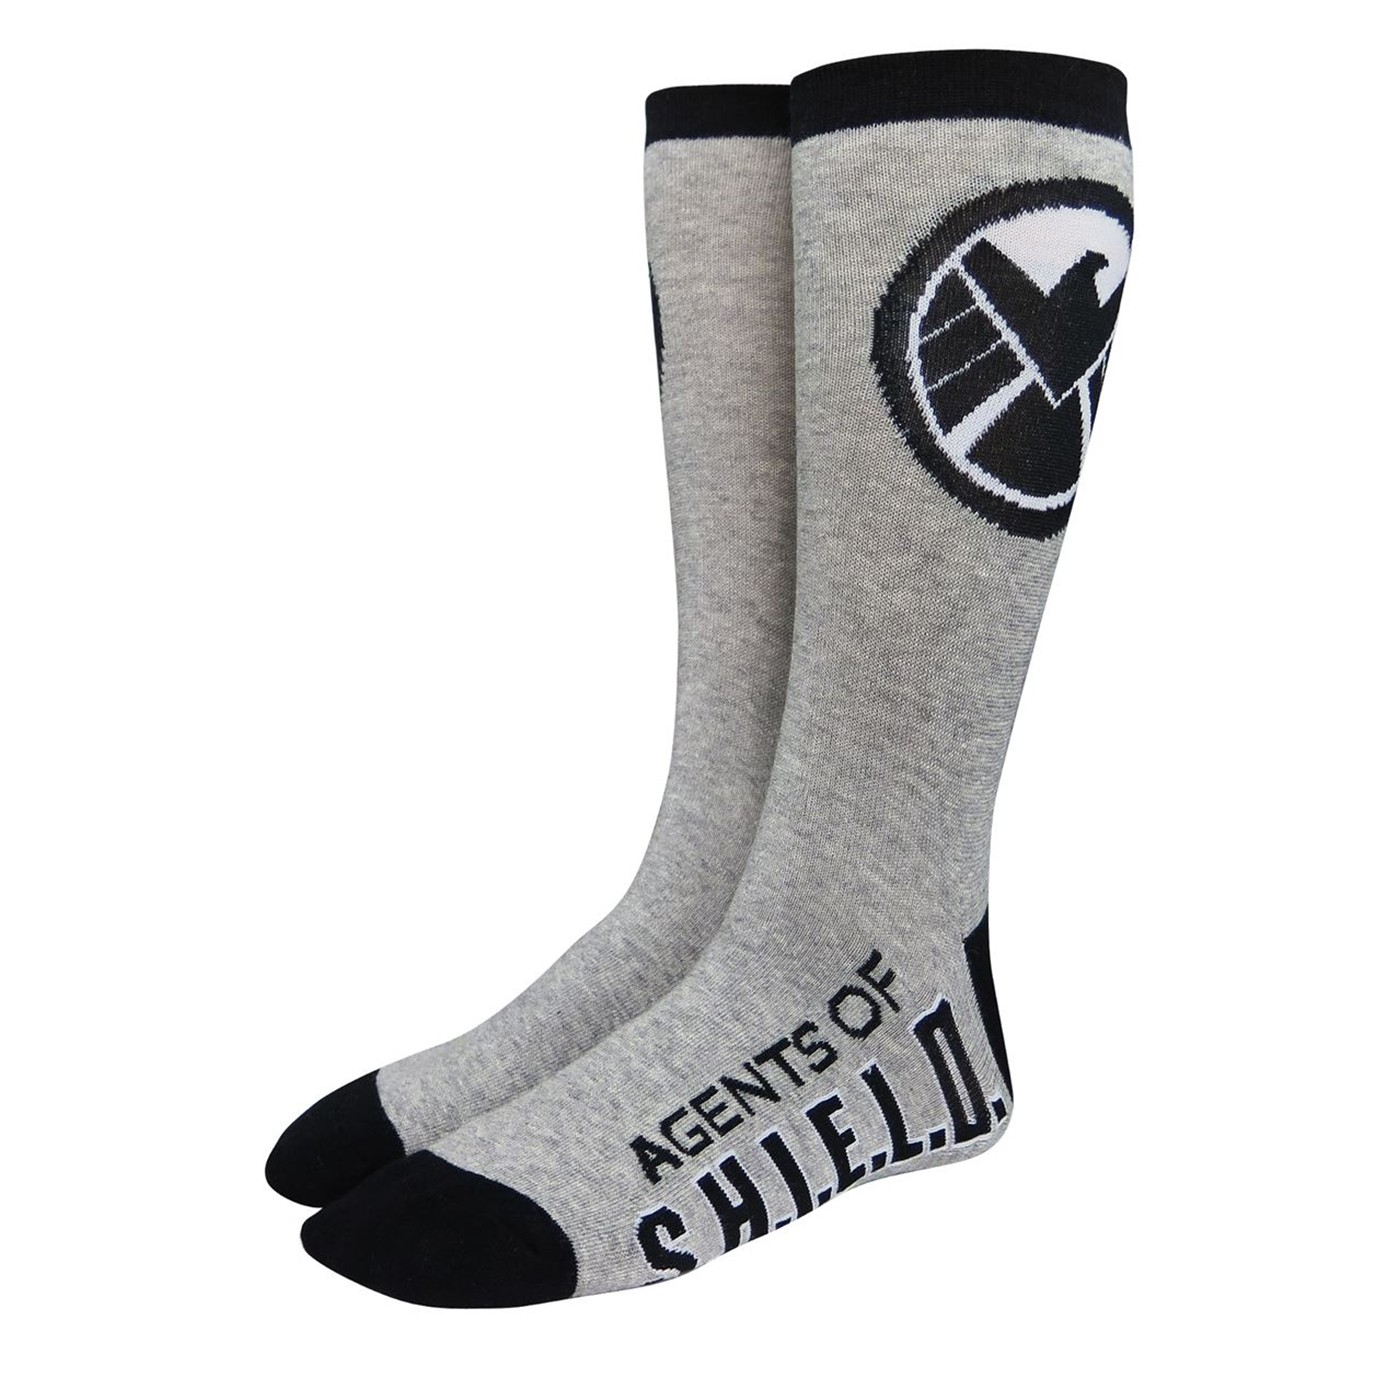 295cabc7d28f7 Agents of Shield Symbol Crew Socks. $6.99 Reg.$8.99